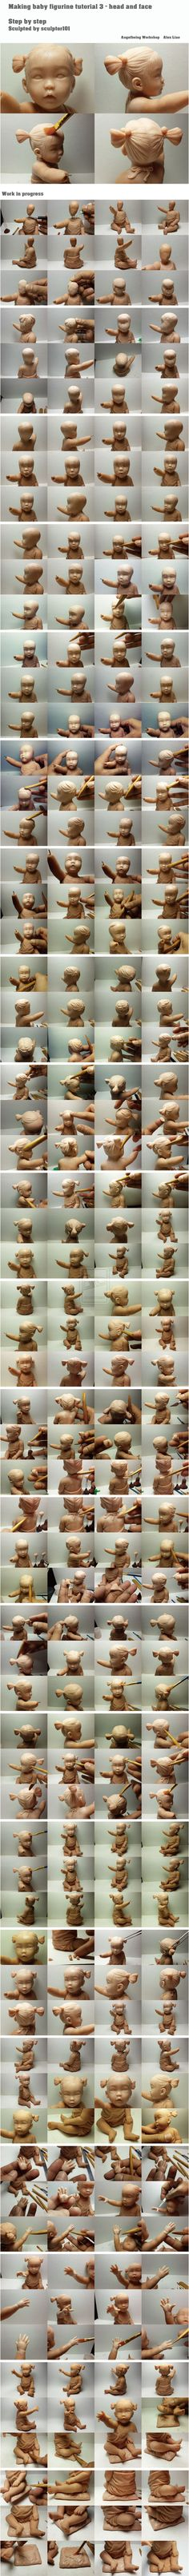 Making baby figurine tutorial 3 by sculptor101.deviantart.com on @DeviantArt